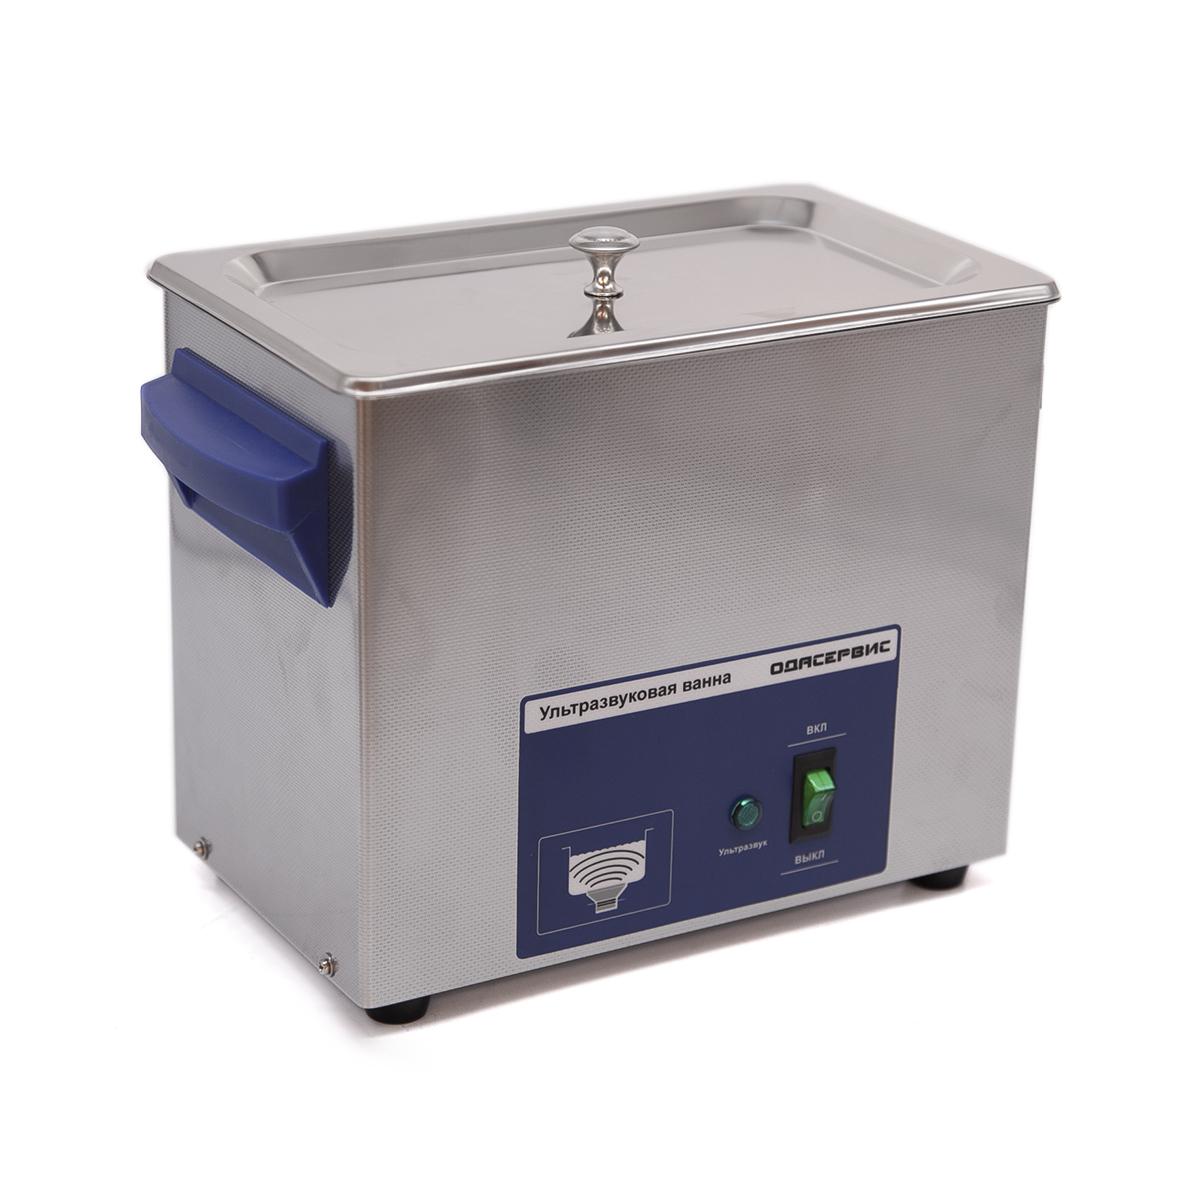 Ультразвуковая ванна 3 л ОДА Сервис ODA-M30